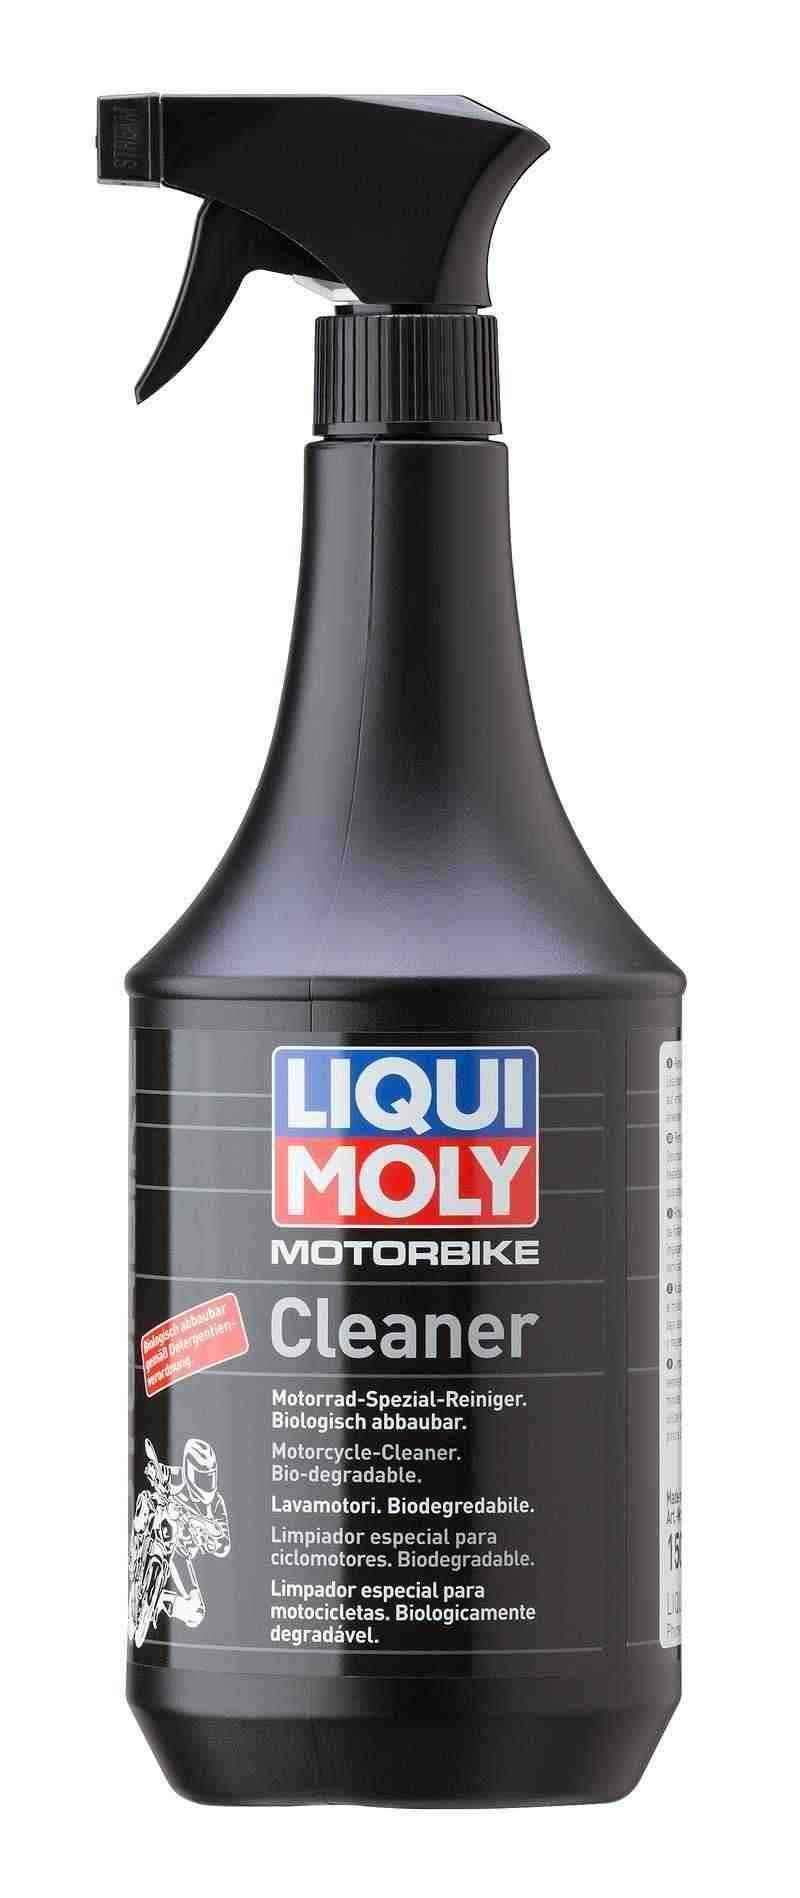 Liqui Moly Cleaner čistič na motorku